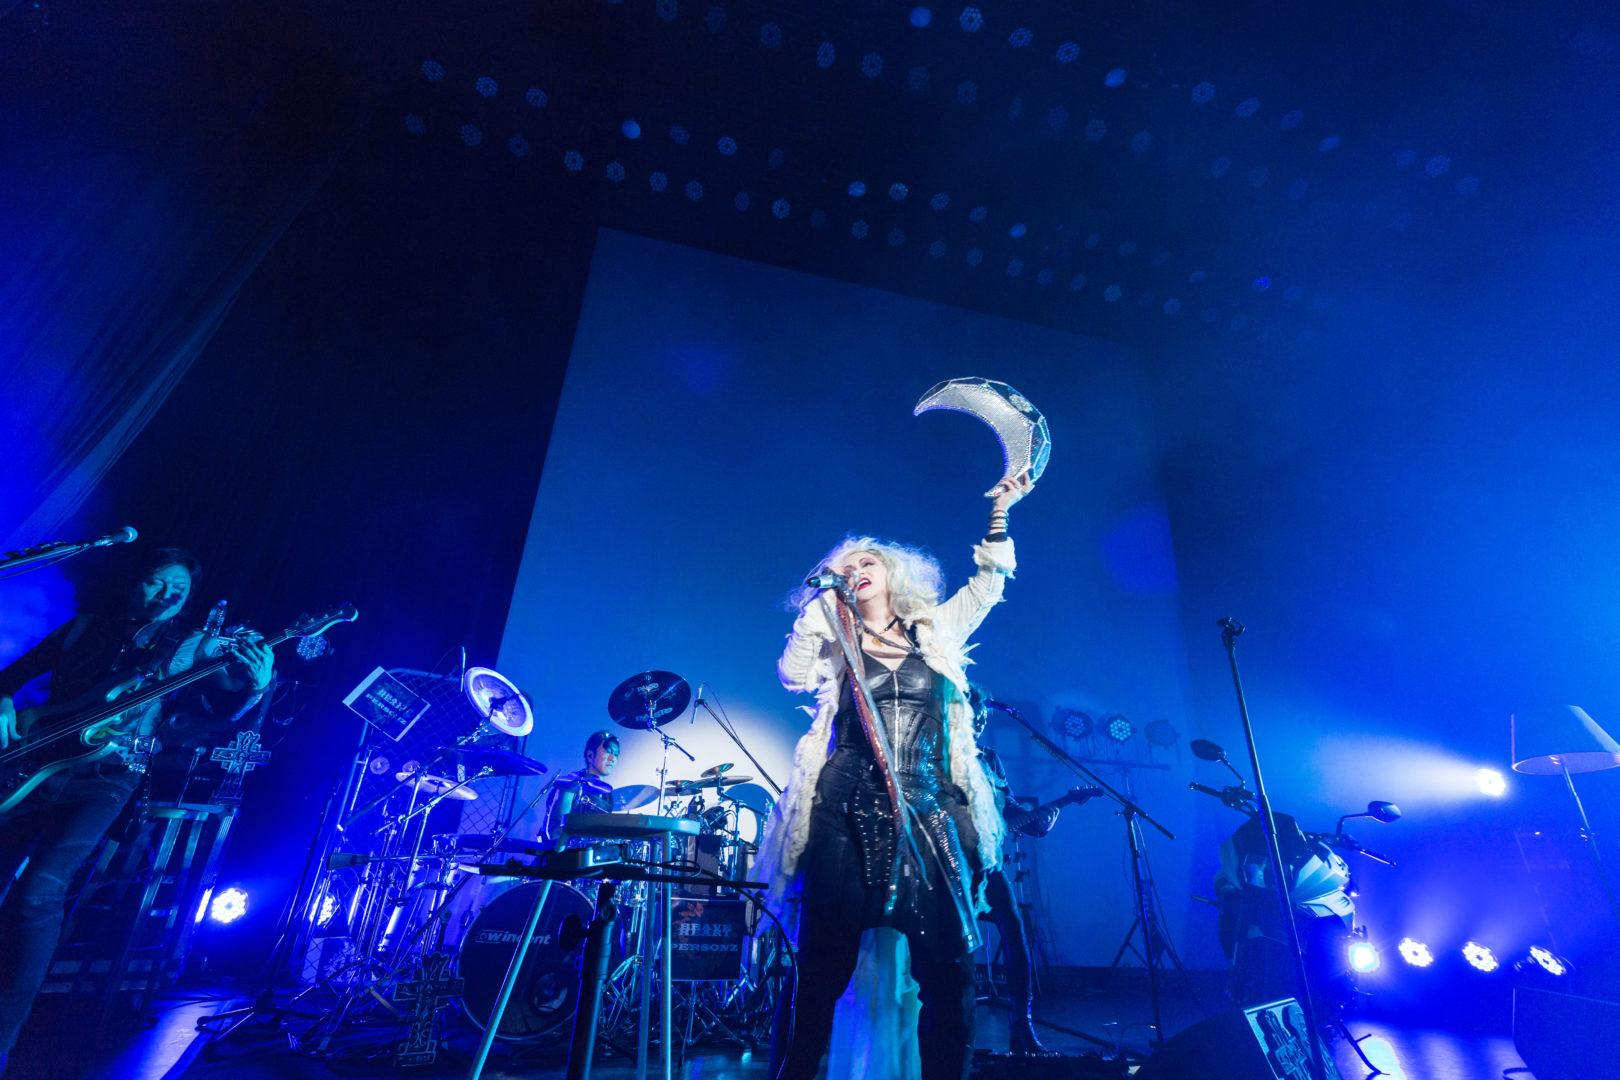 PERSONZ結成35周年企画[NEWS 03]『「HEART OF GOLD」LIVE+STORY PERFORMANCE PERSONZ+原田美枝子+左右田薫』